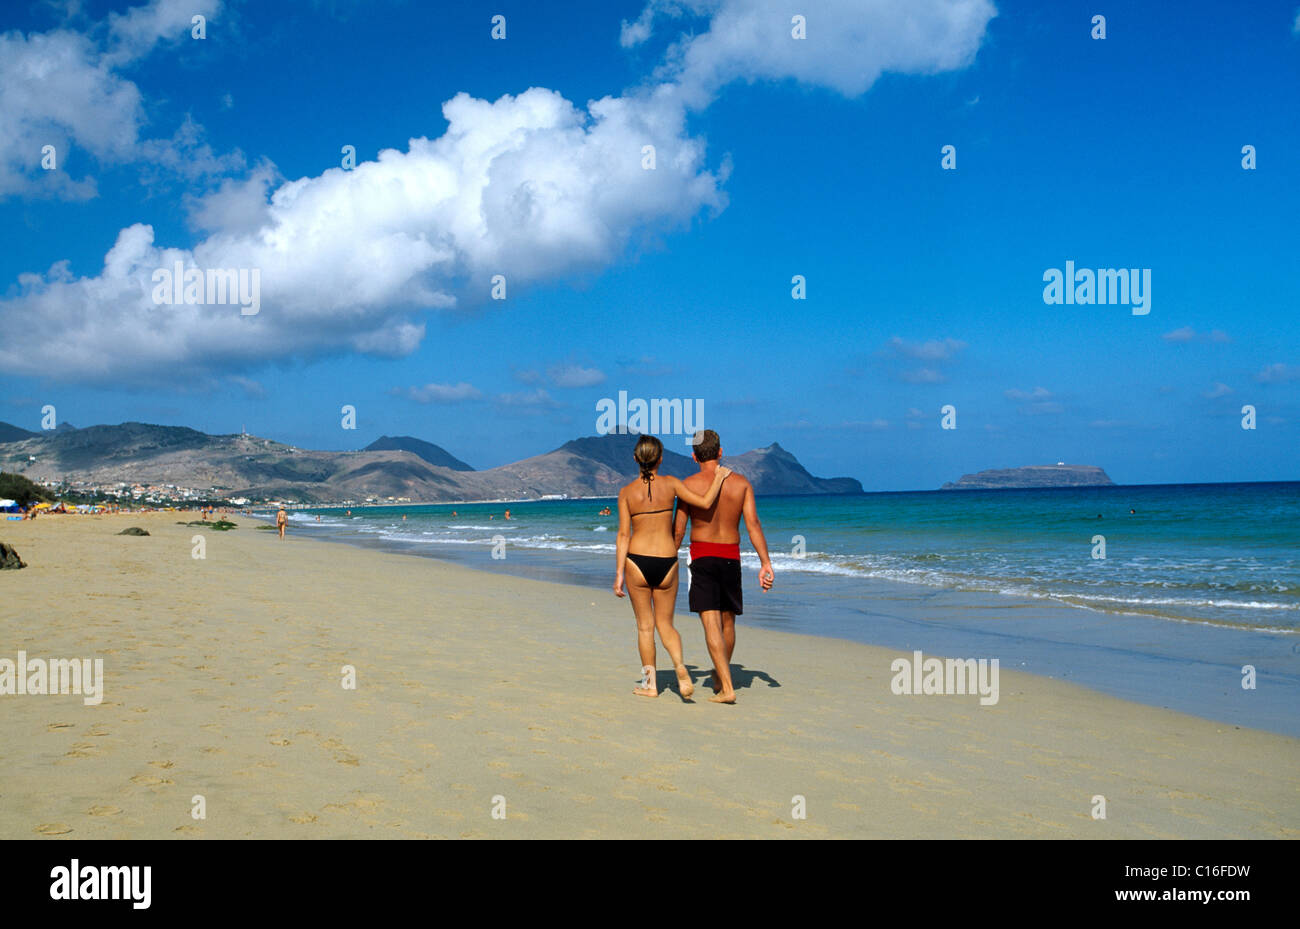 Couple walking along a sandy beach on Porto Santo Island, Madeira, Portugal, Europe - Stock Image